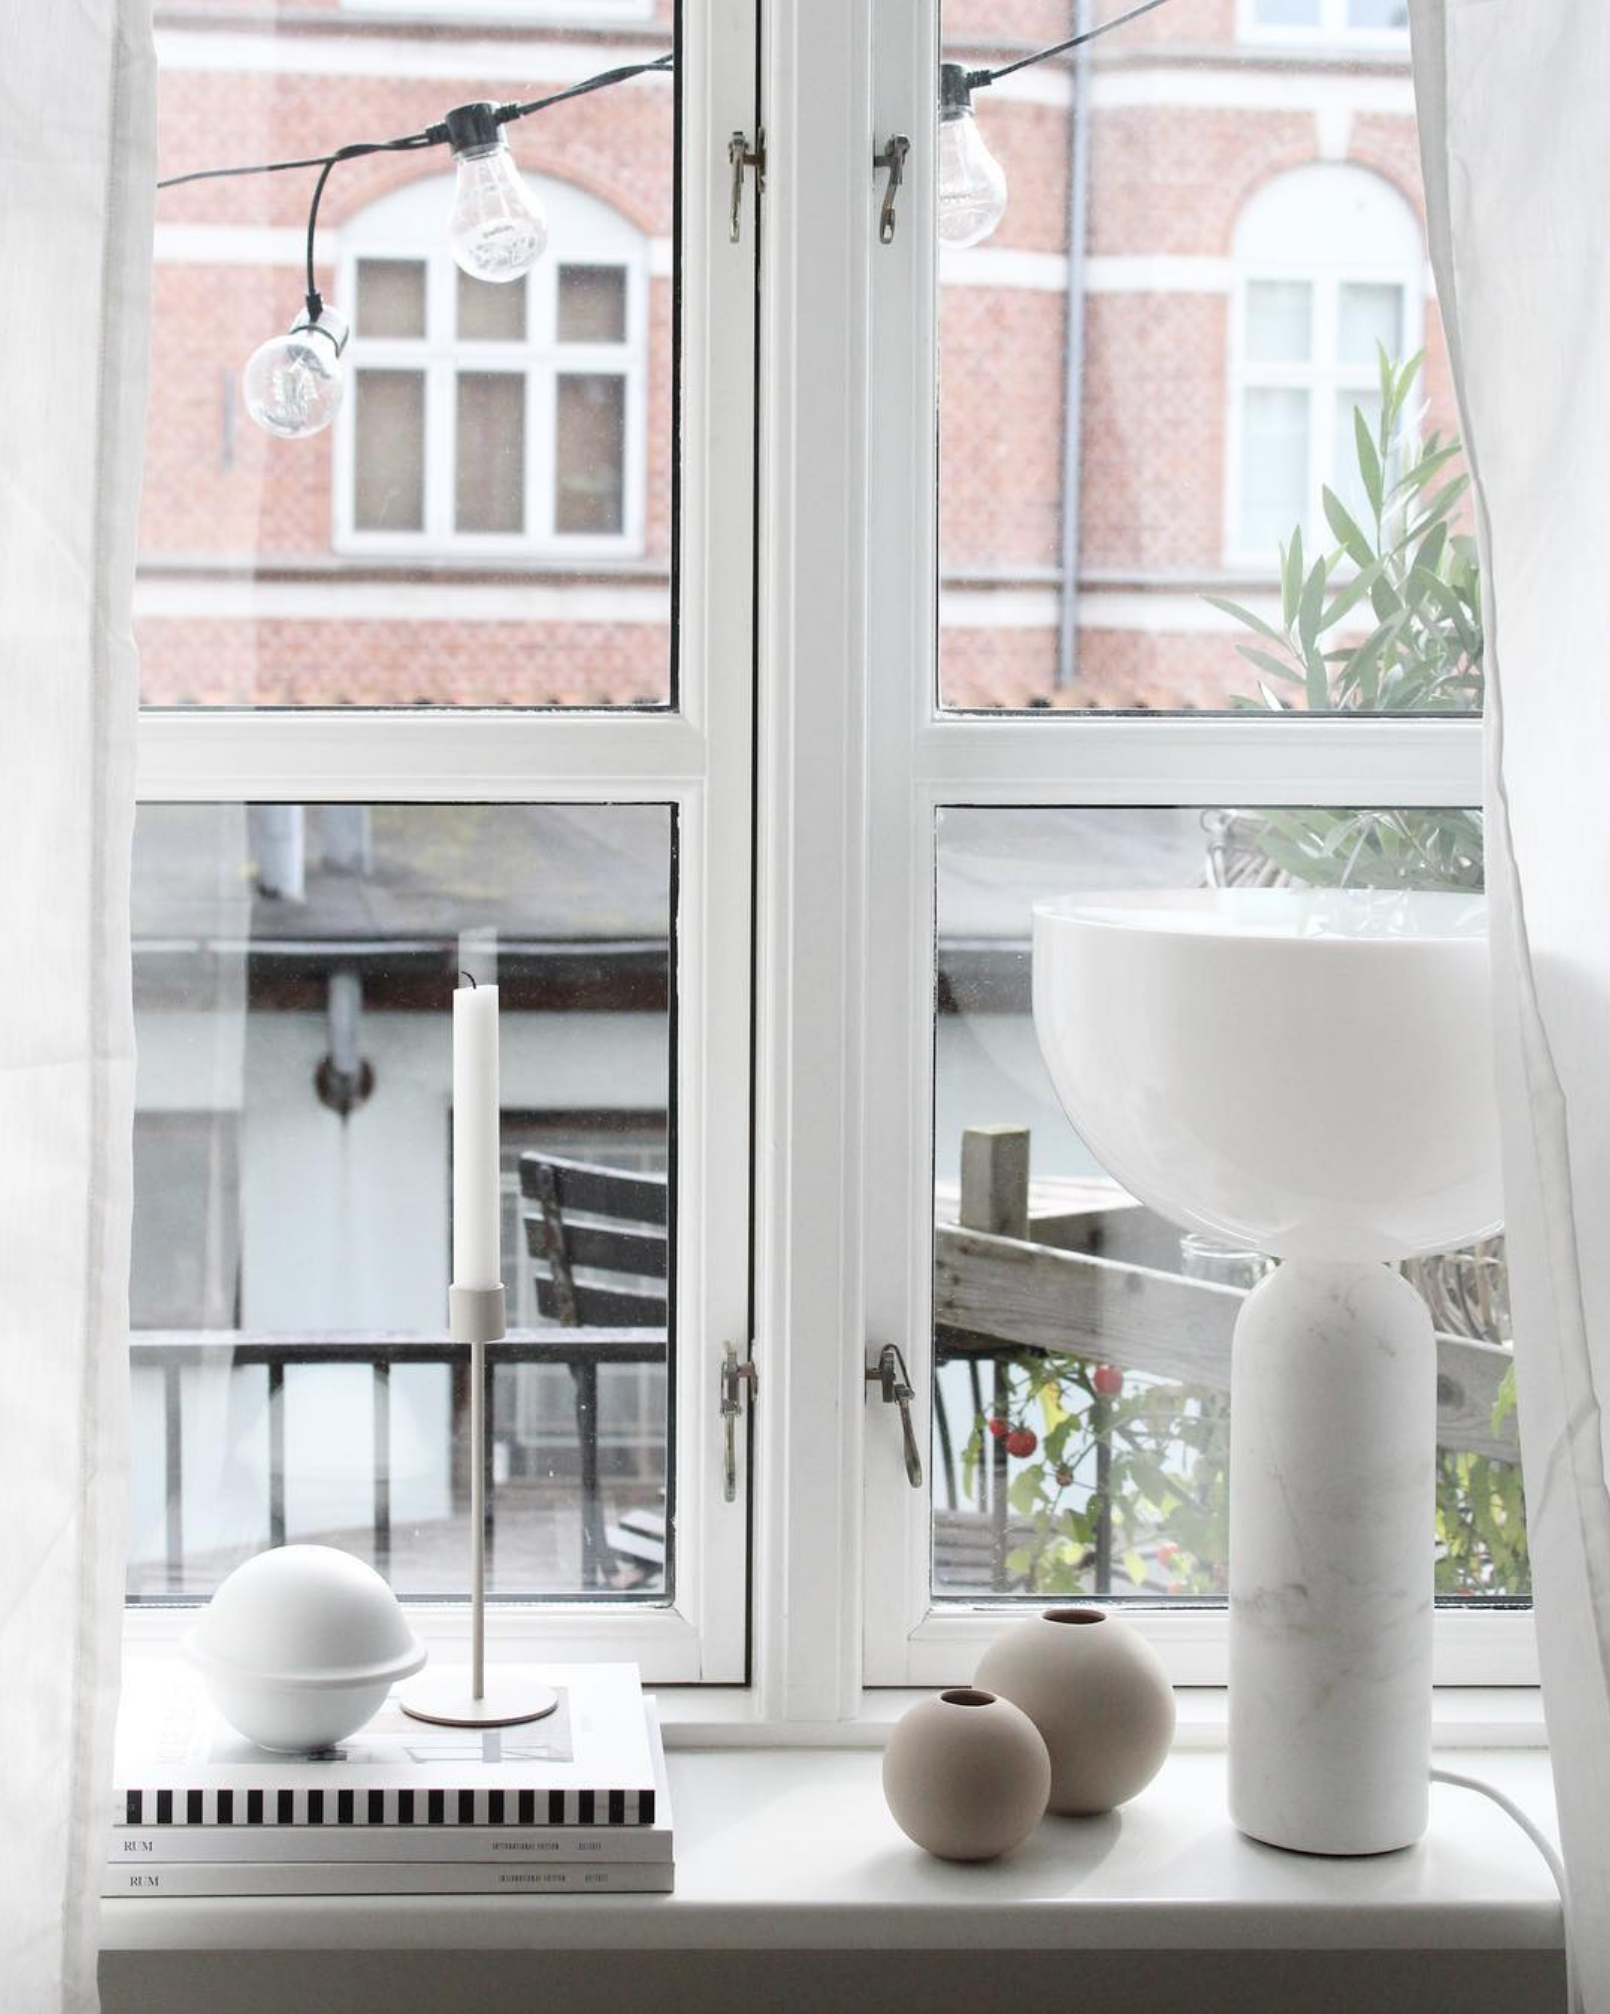 Window setting by @carlasofiemolge